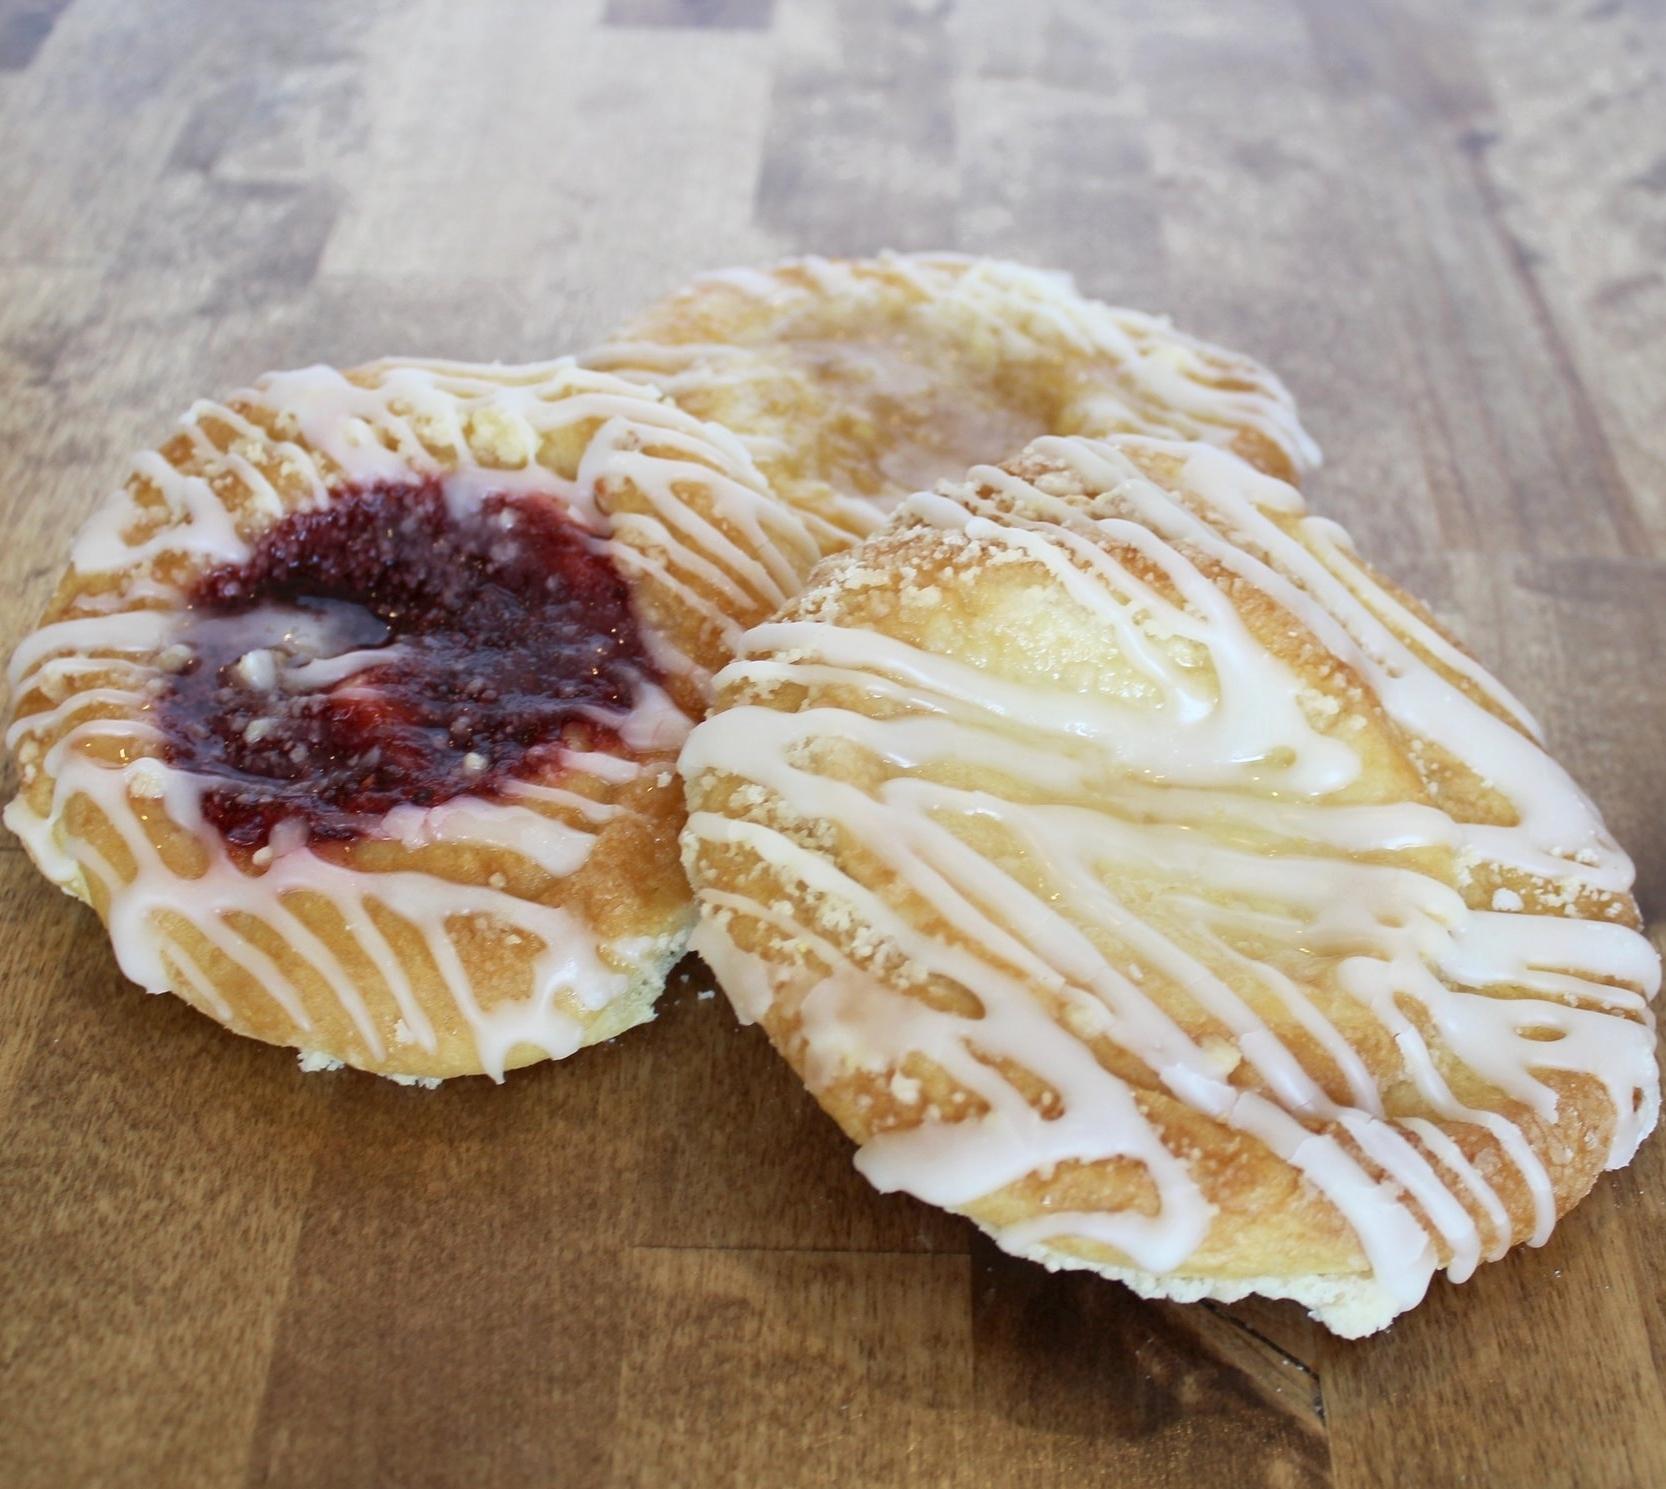 Fruit Filled Danish